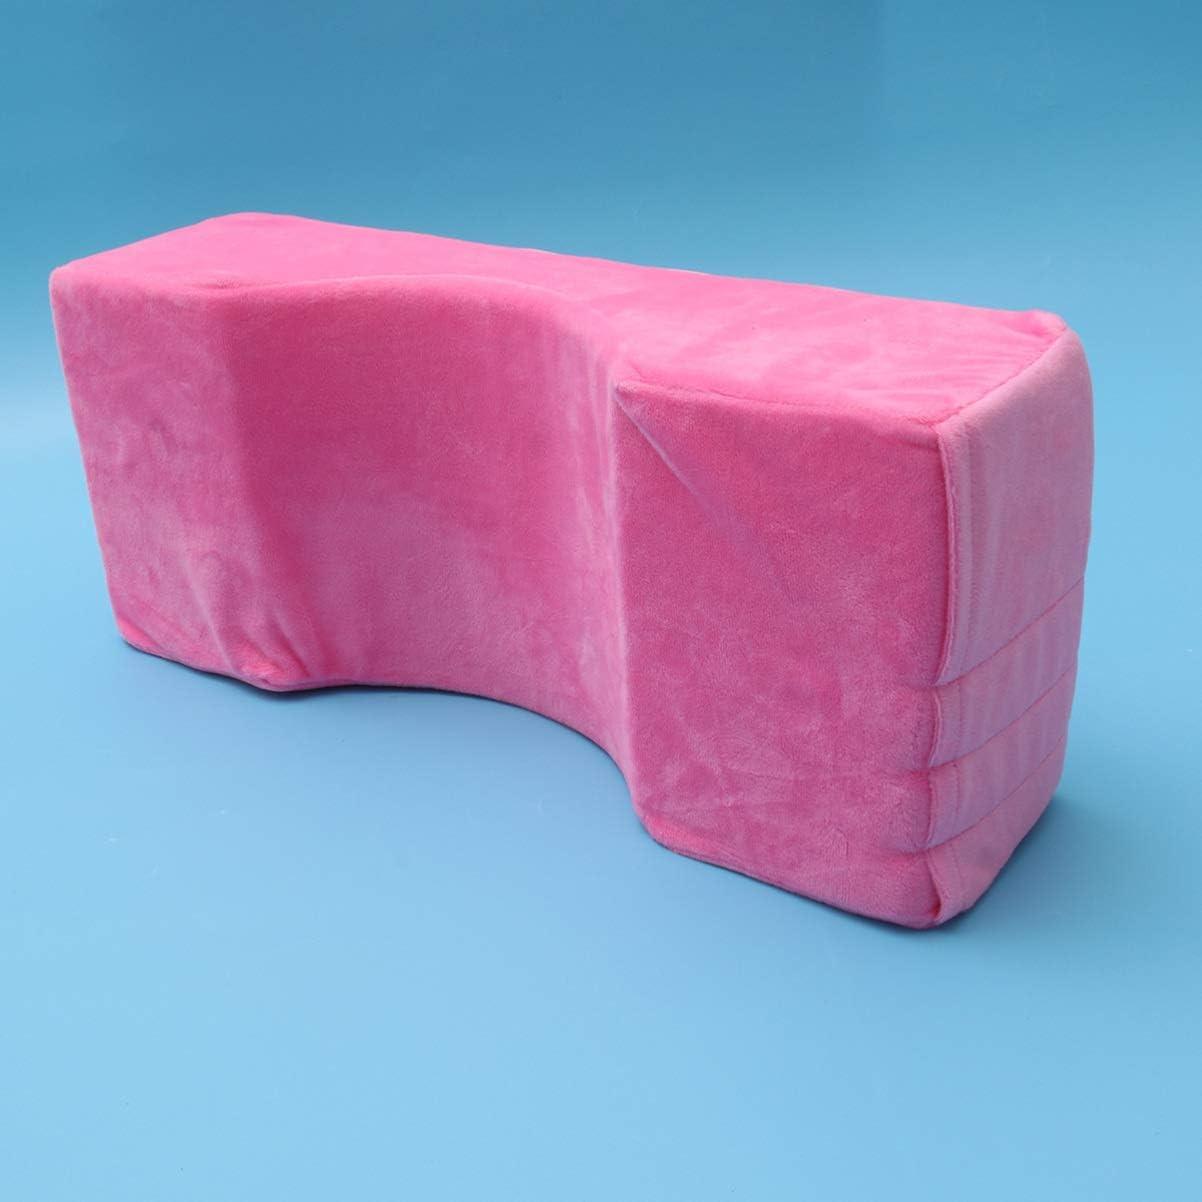 SUPVOX Grafted Eyelash Extension Pillow Memory Curve Contour Salon Pillow Pink